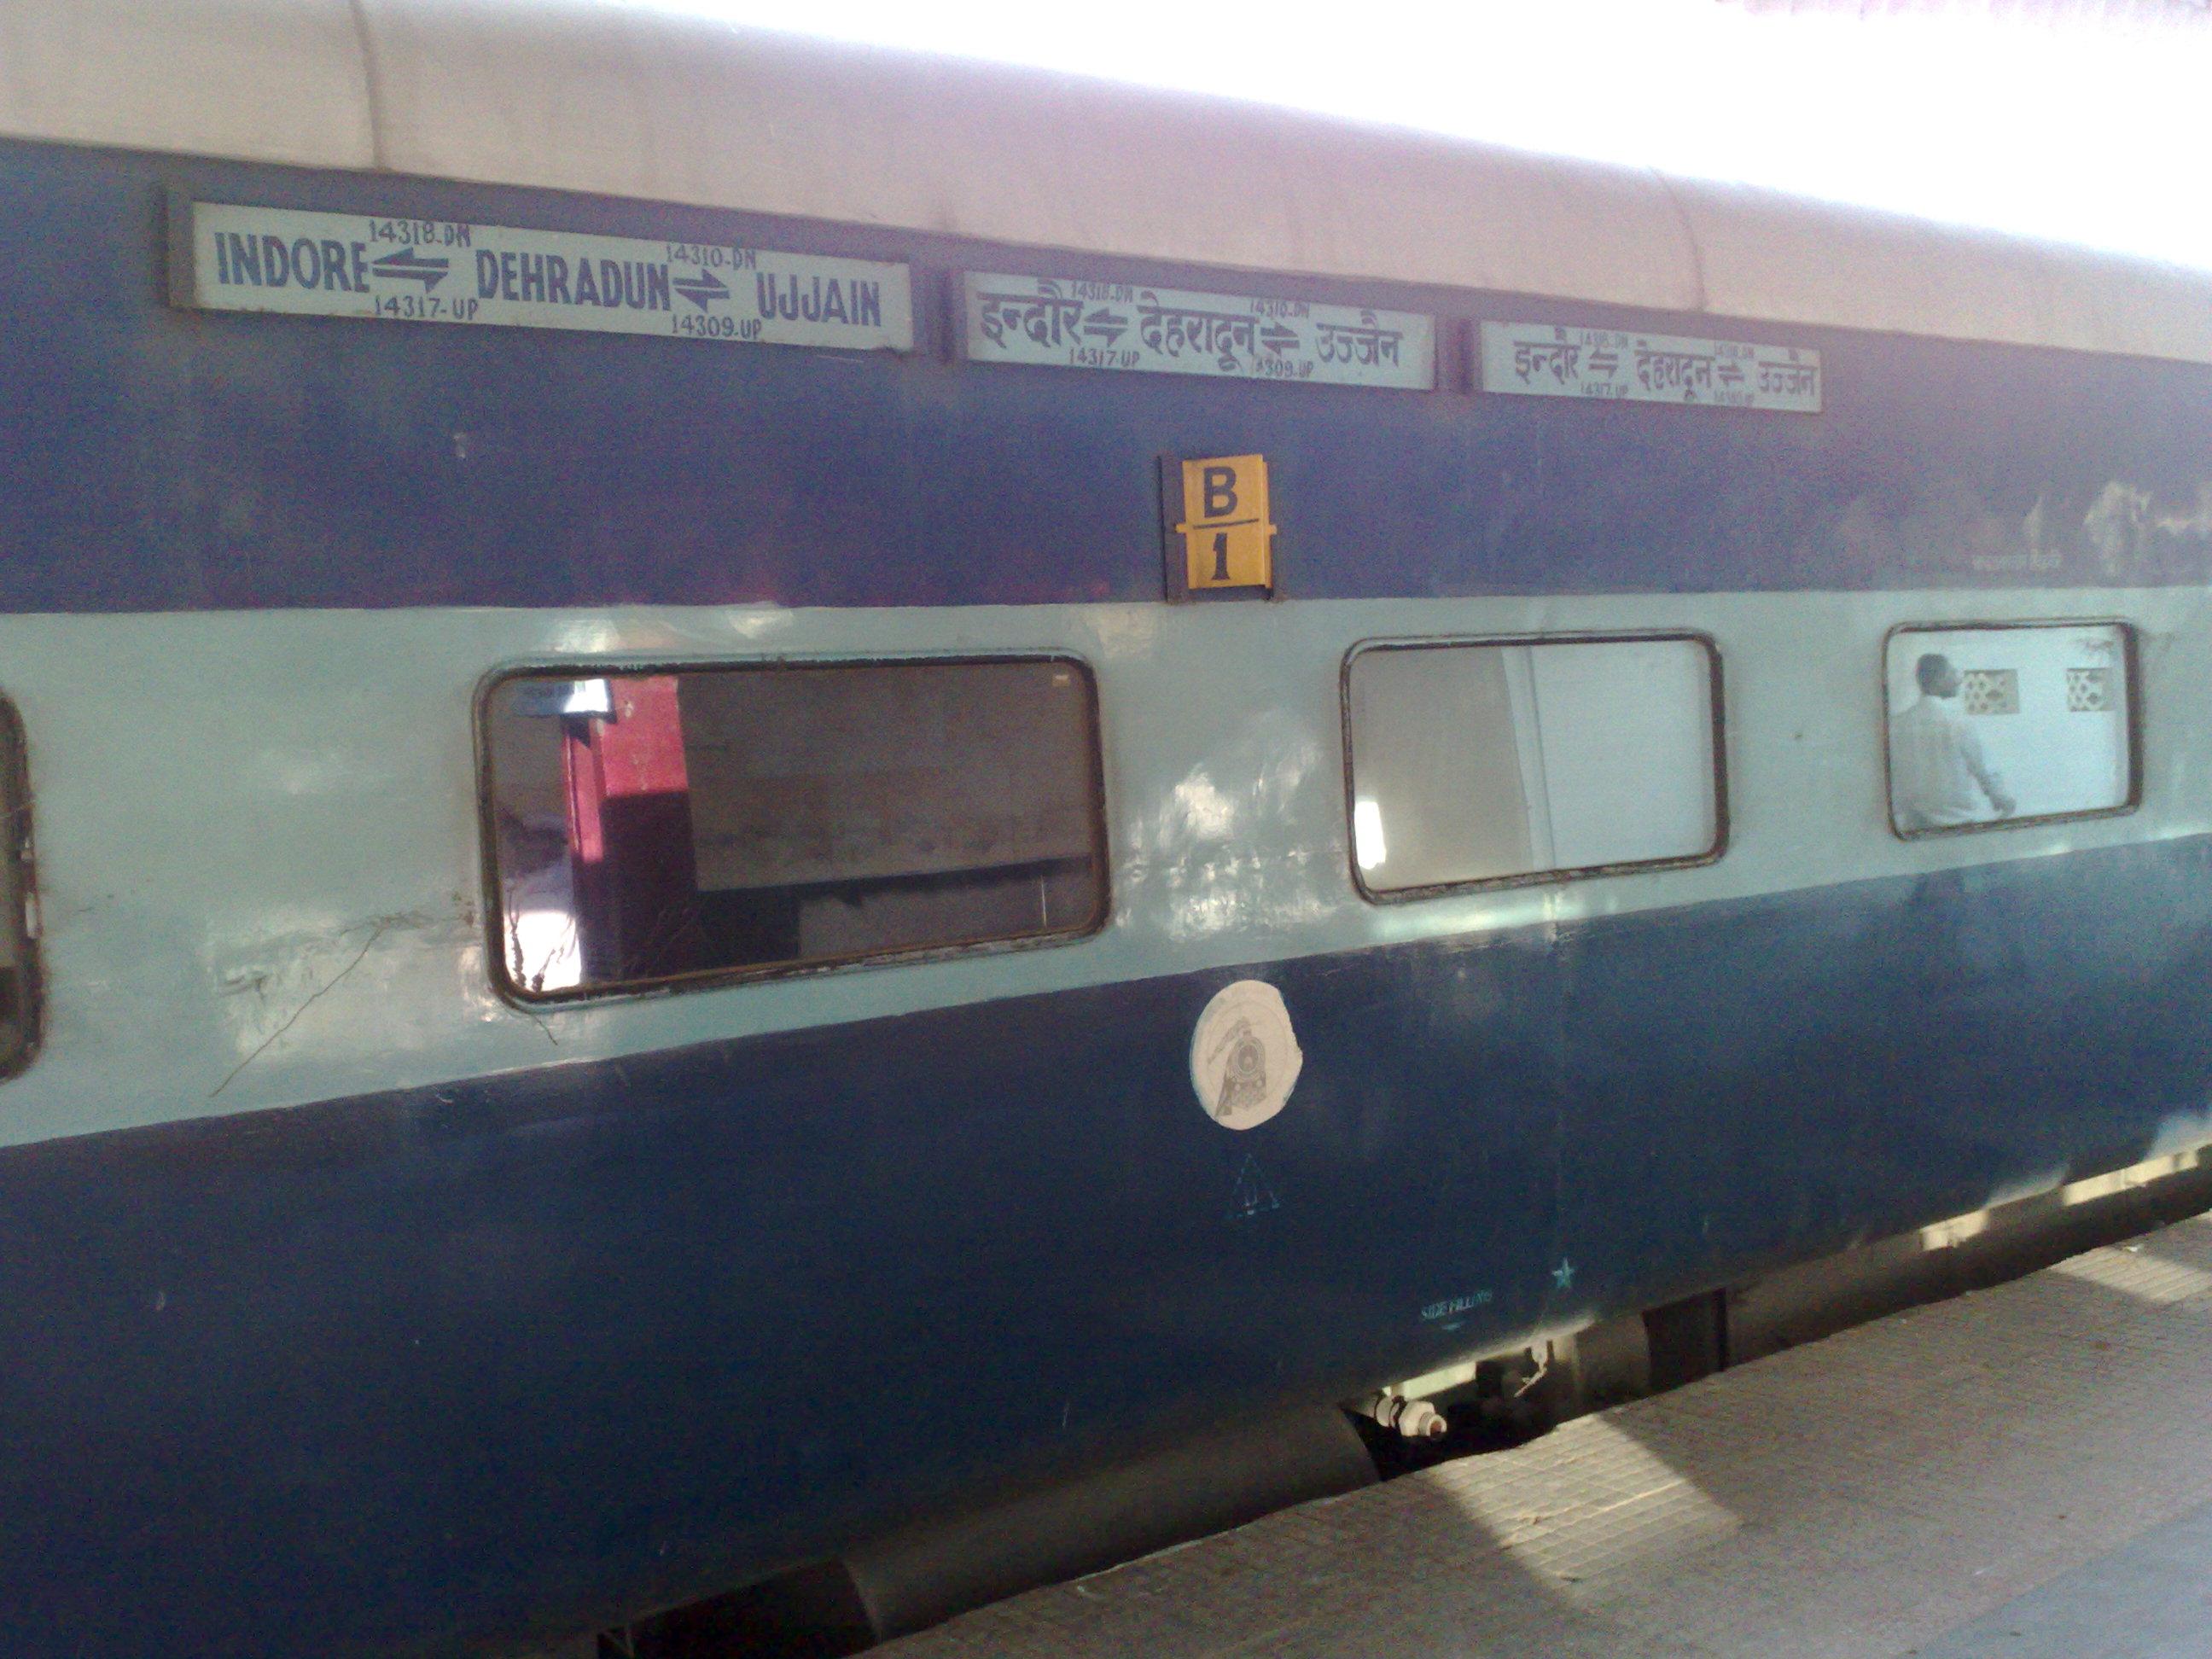 Indore - Dehradun Express